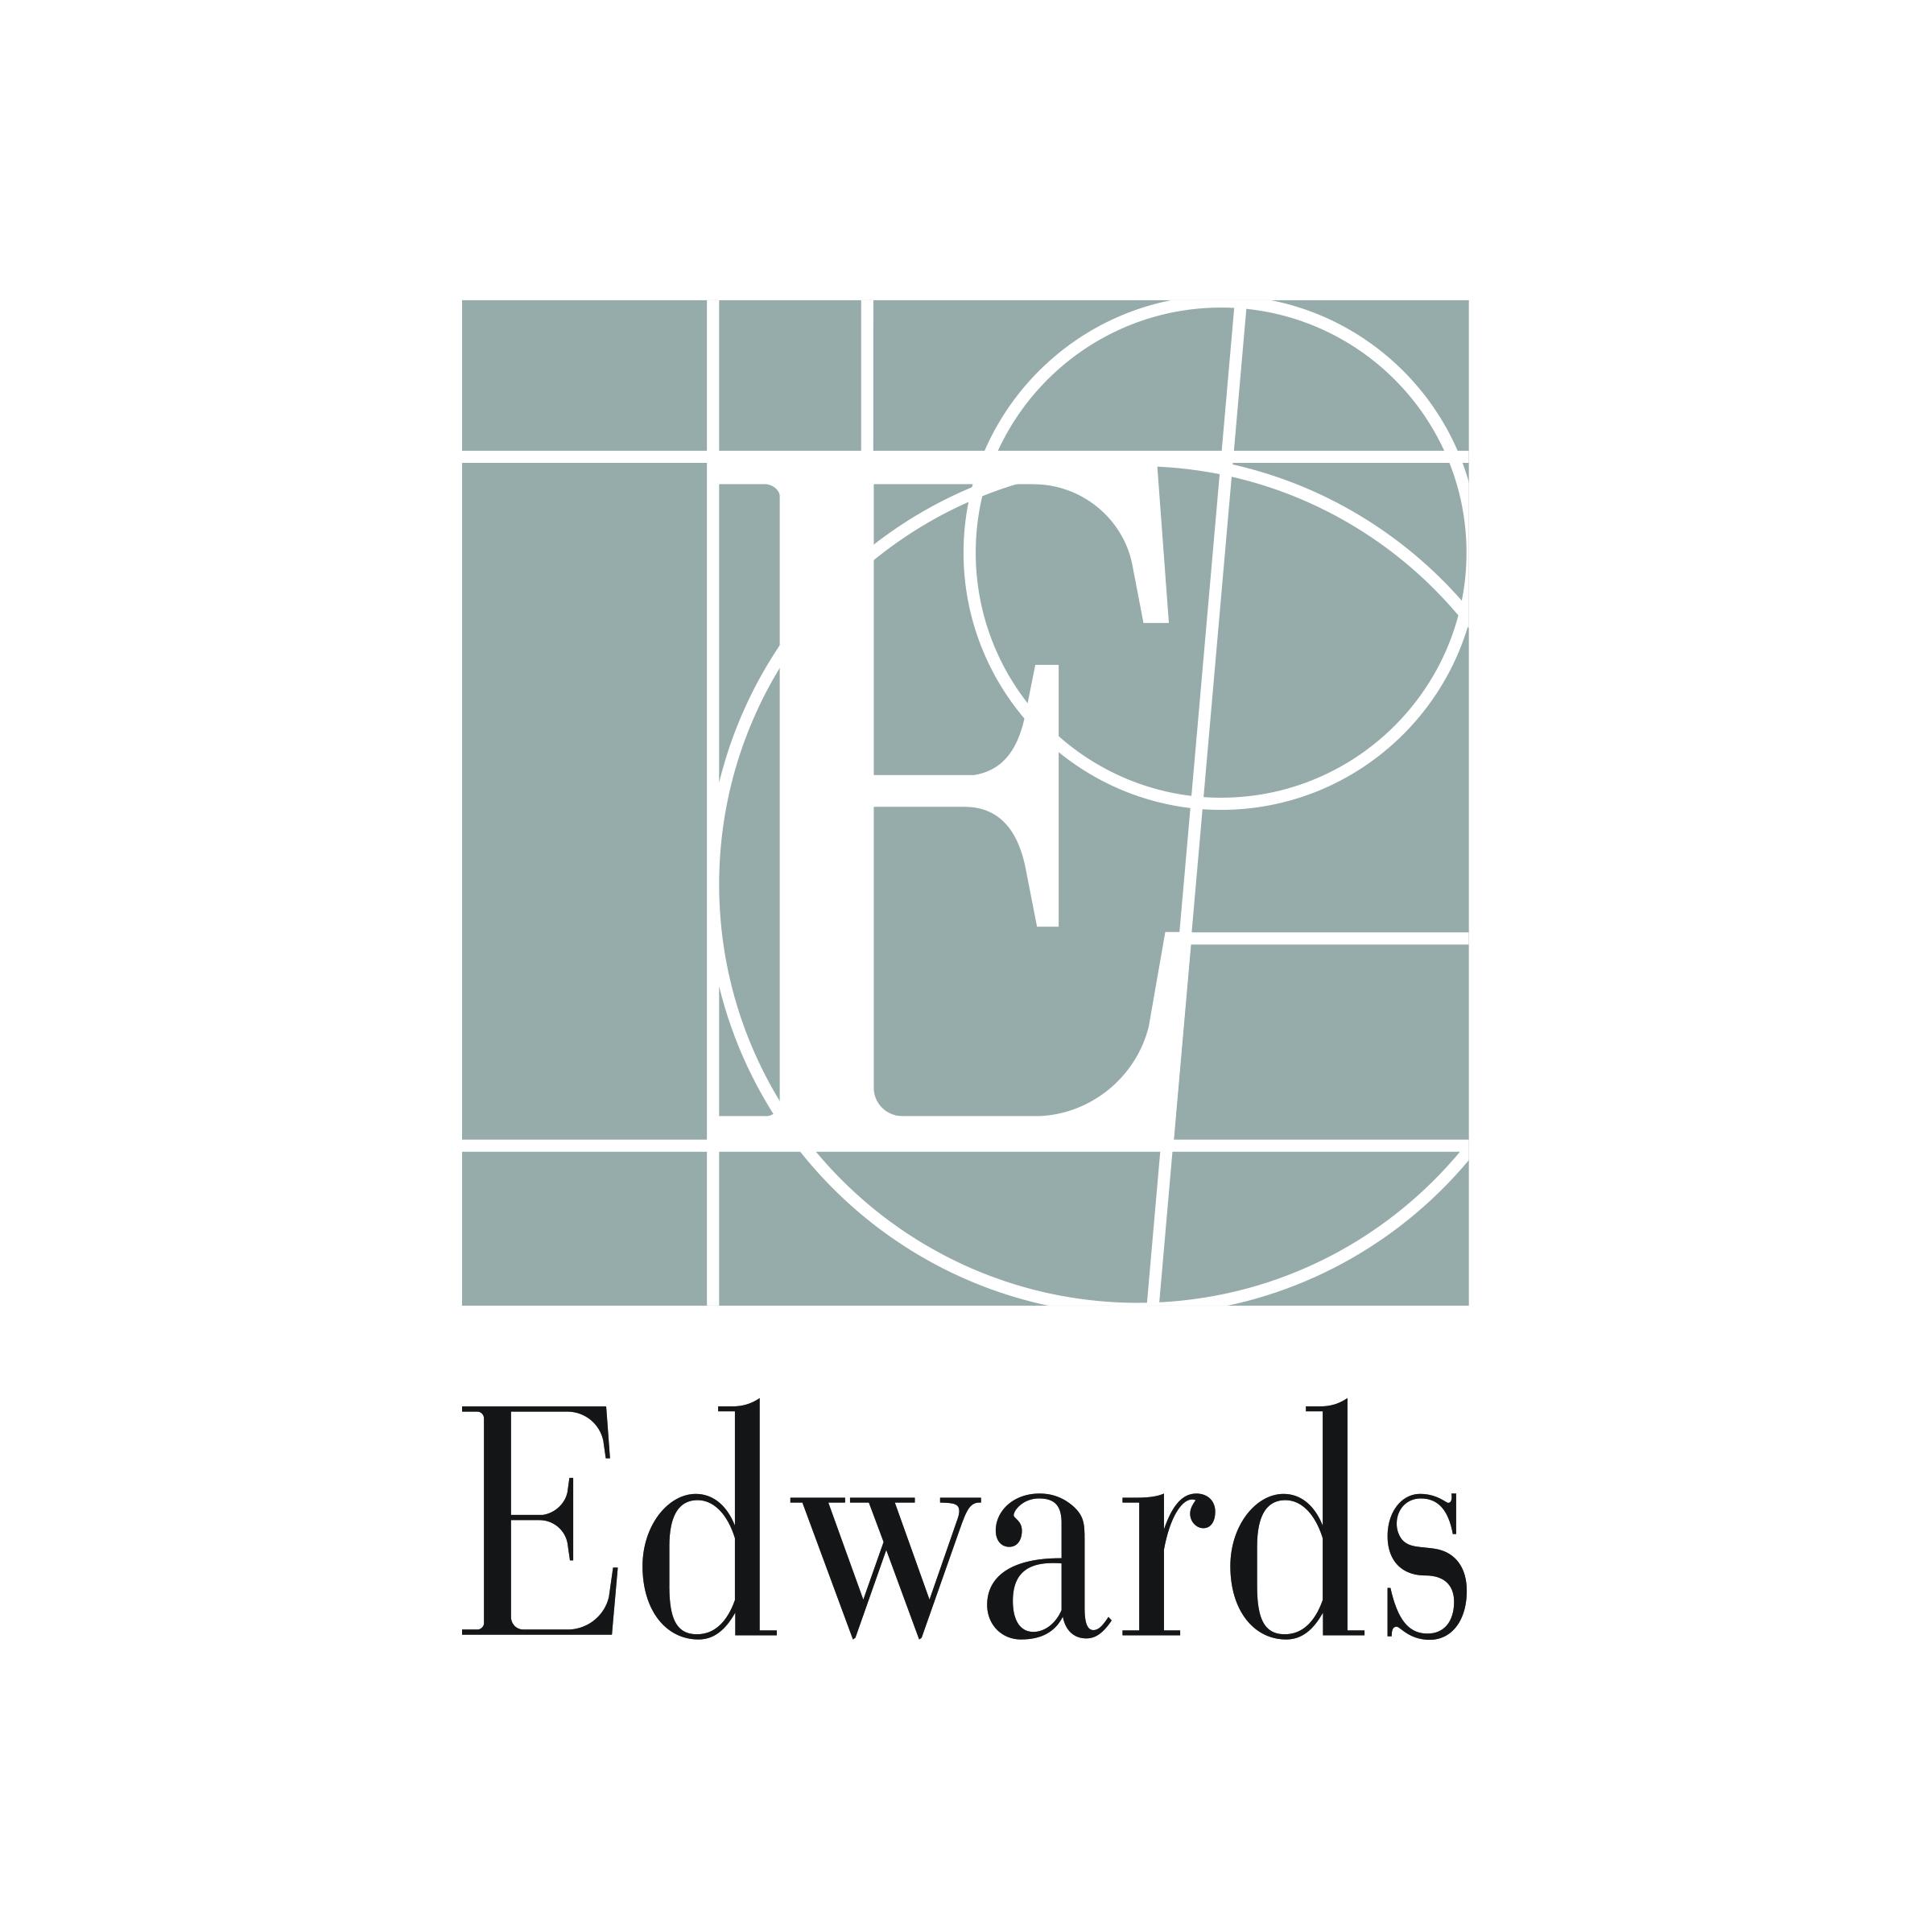 Edwards logo.jpg